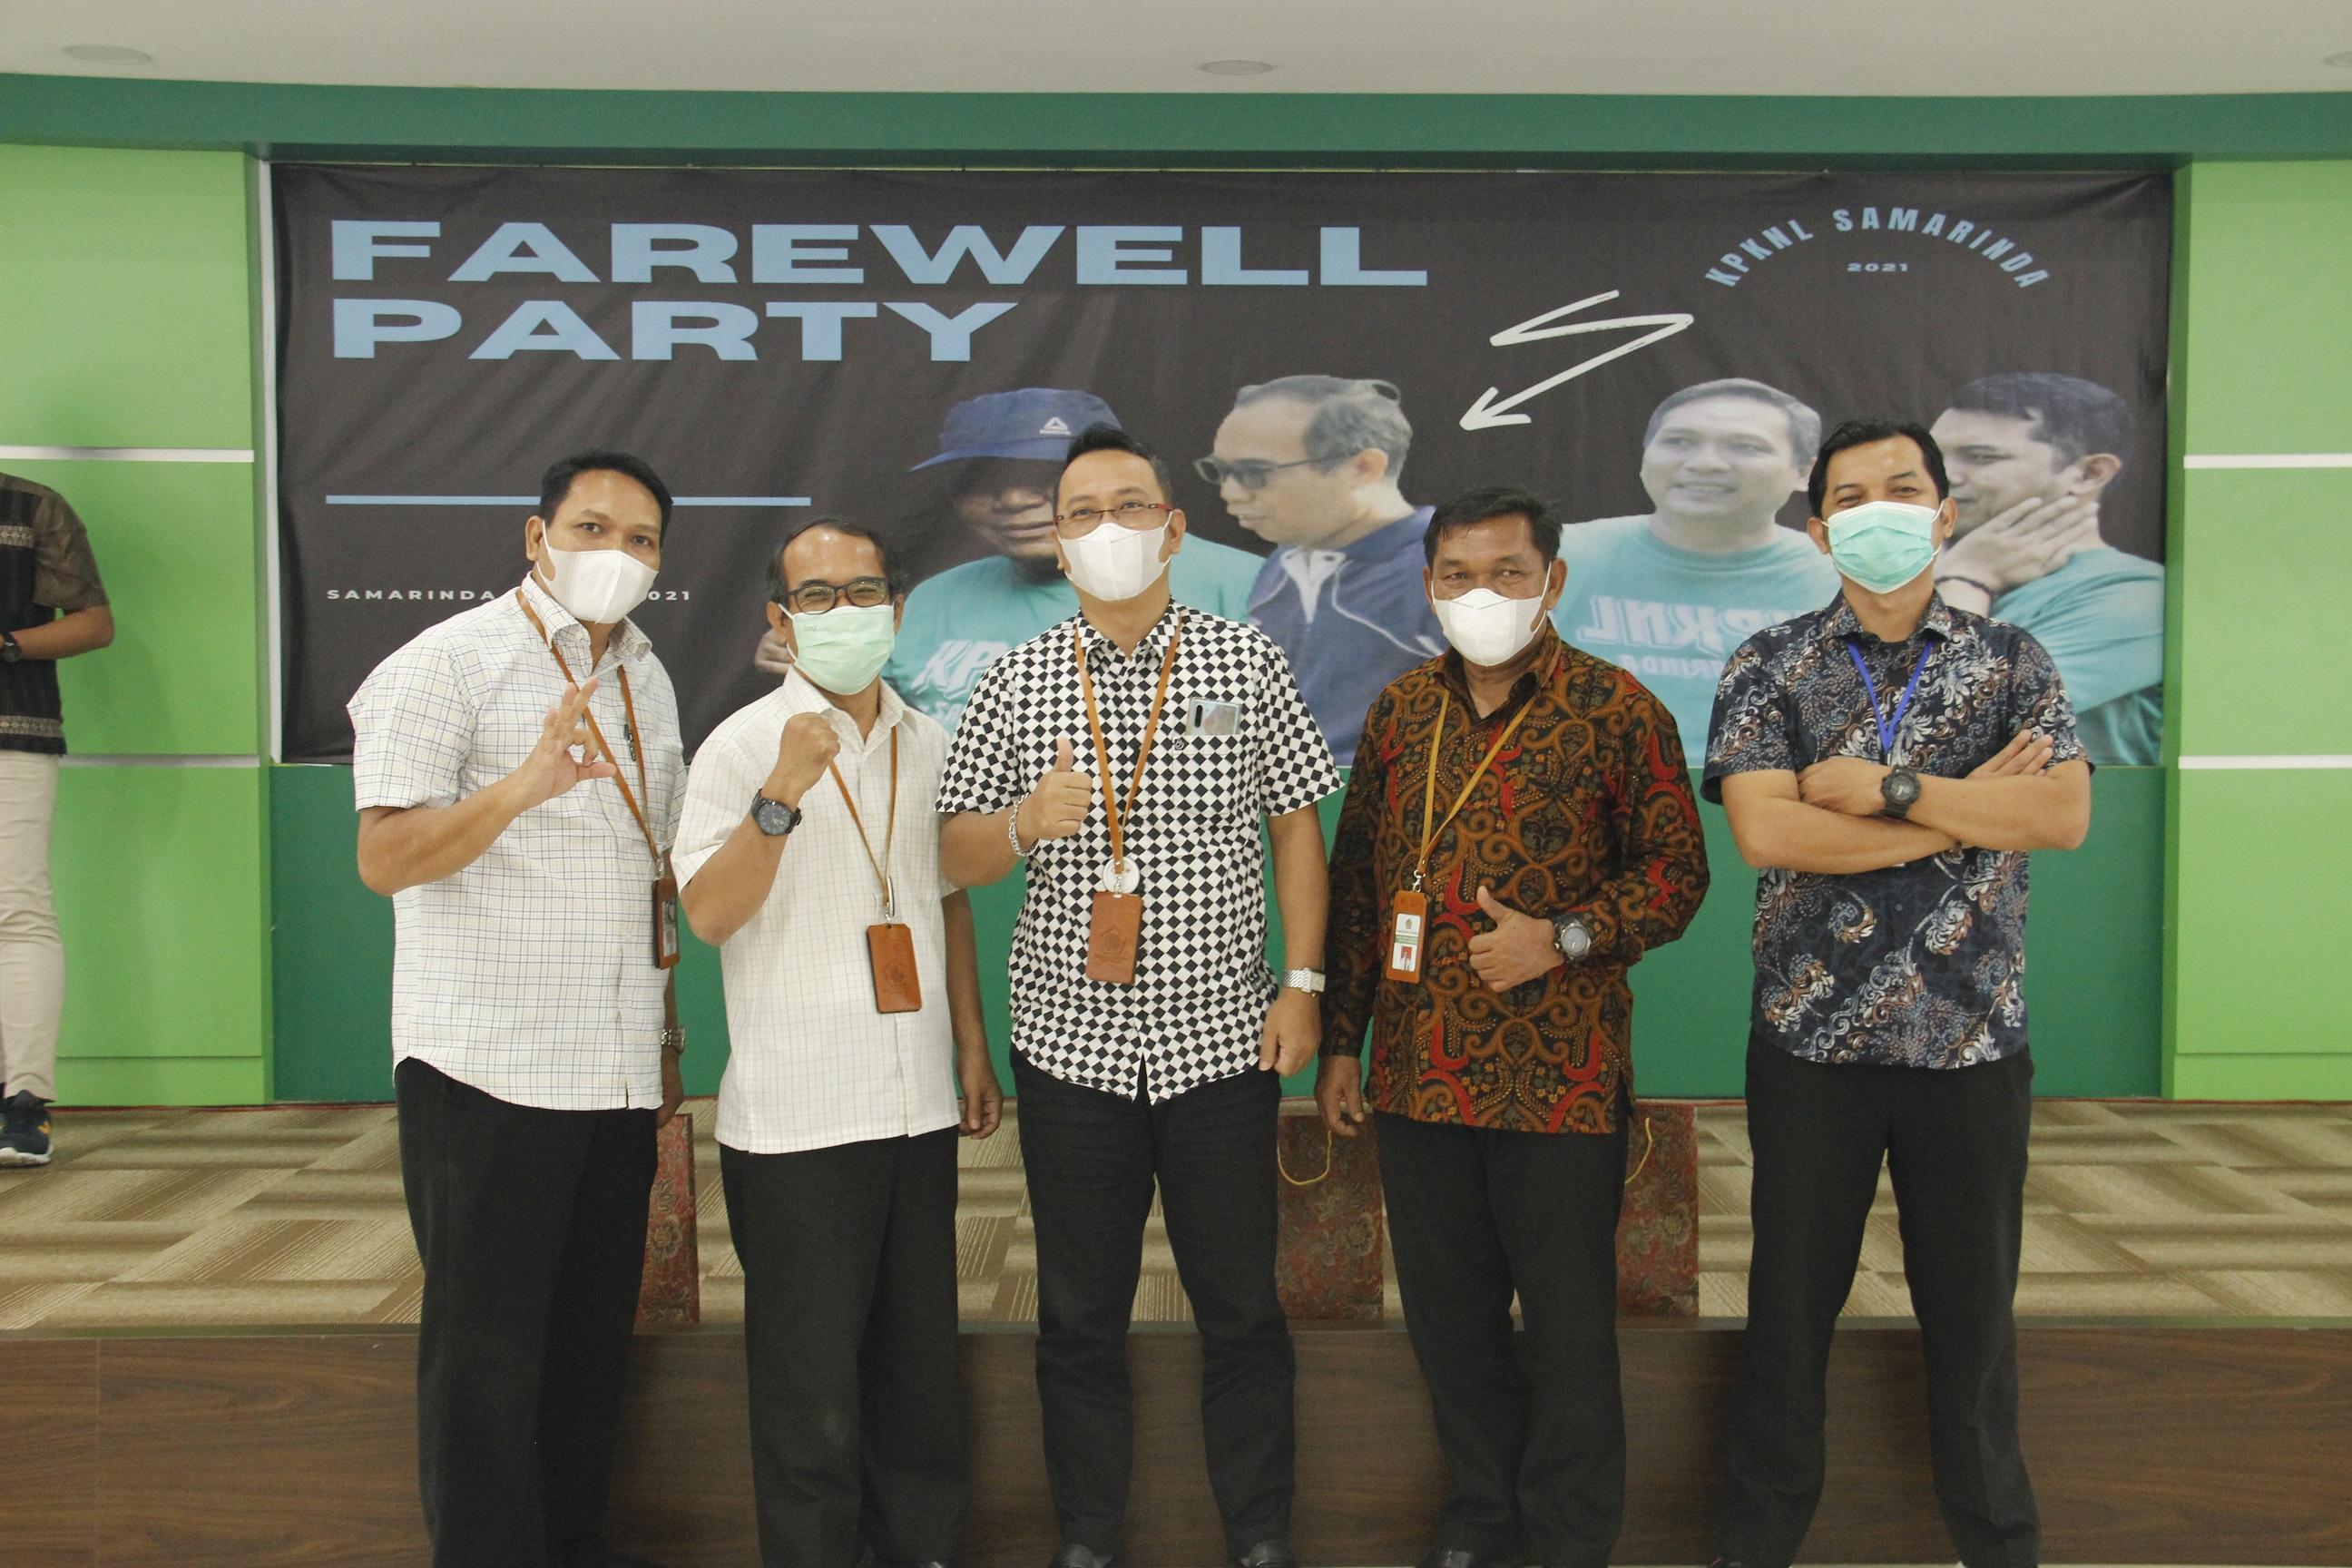 Farewell Party: Patah Tumbuh Hilang Berganti